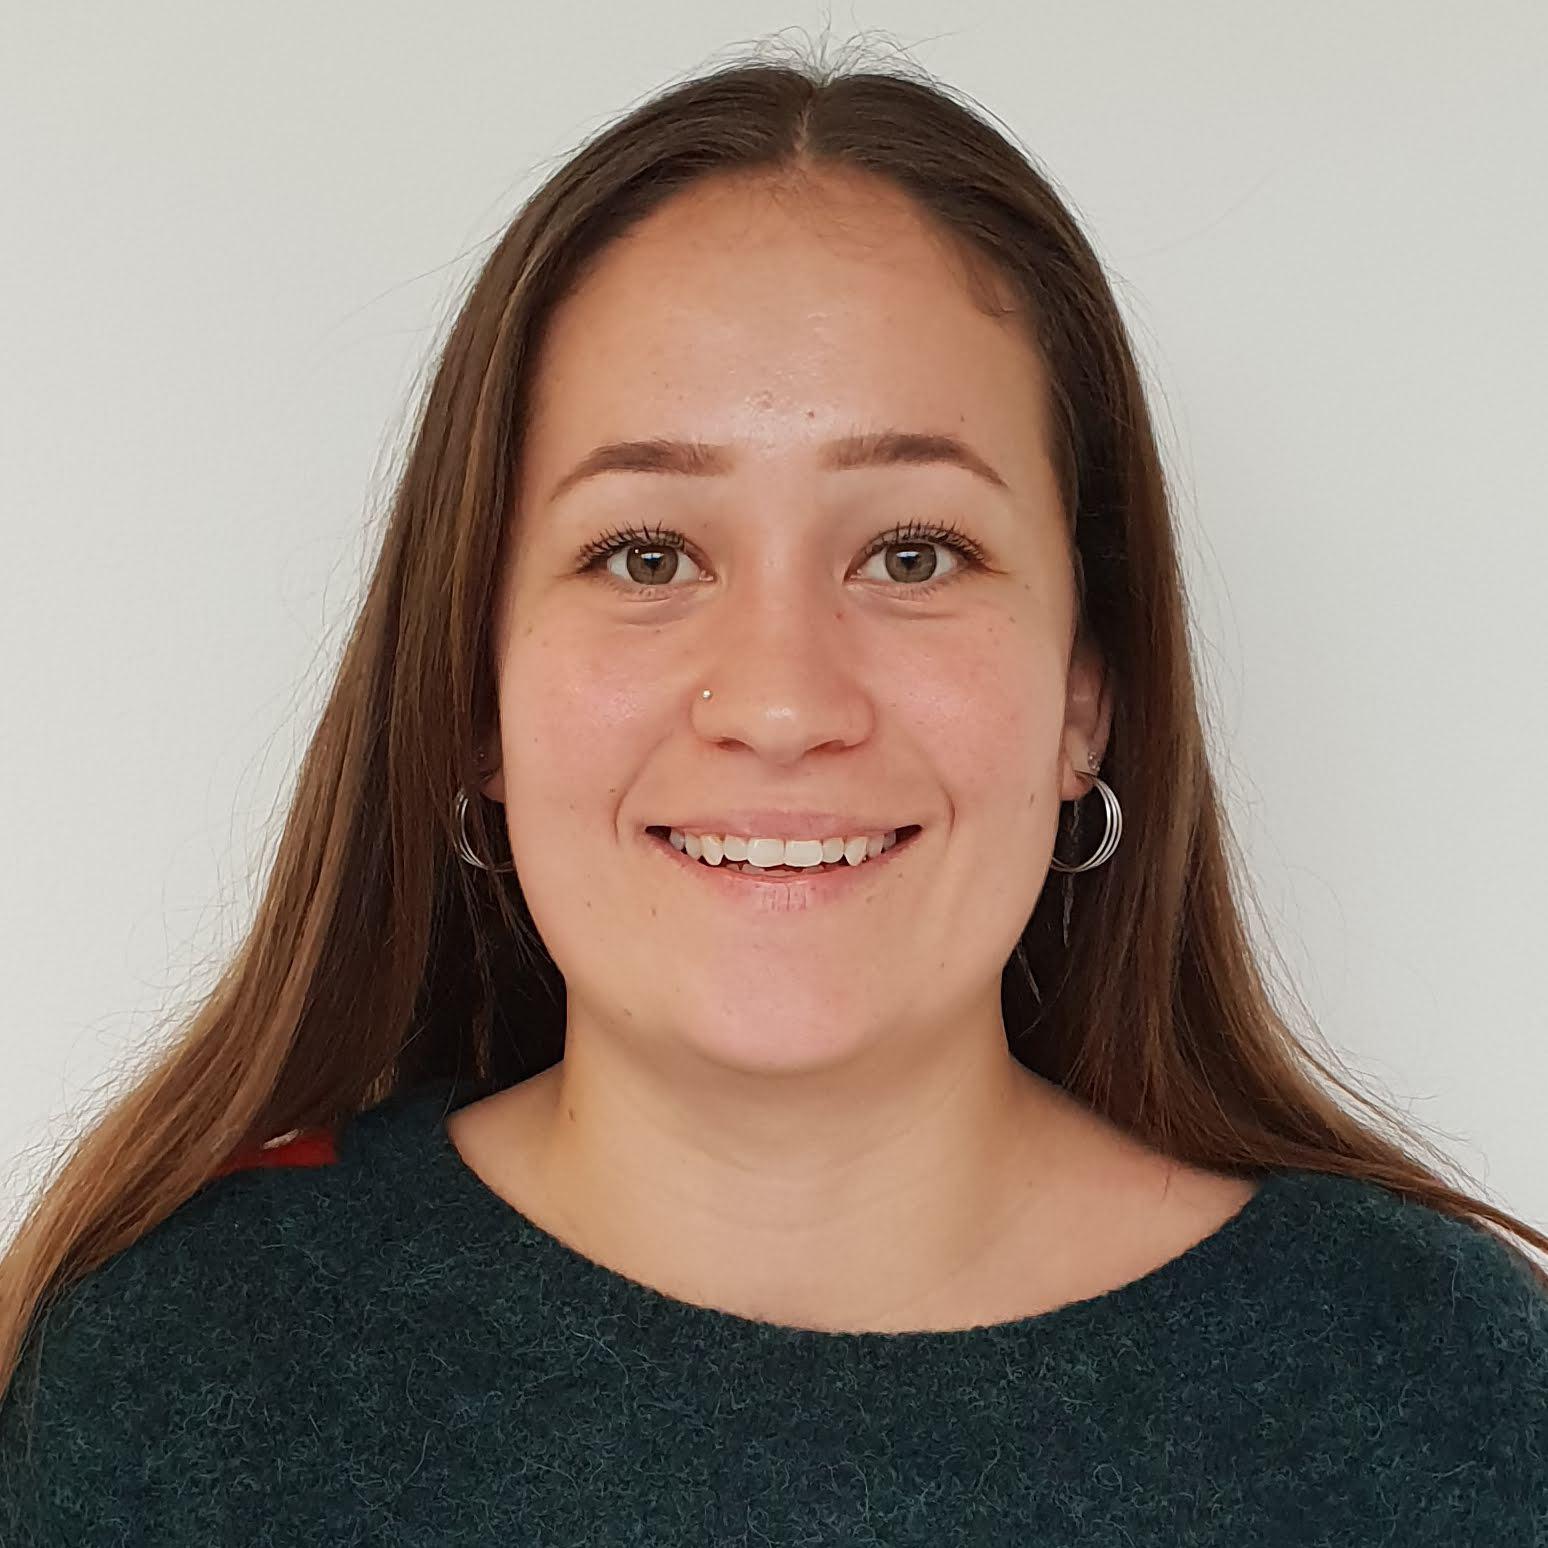 Emily Vind Mortensen